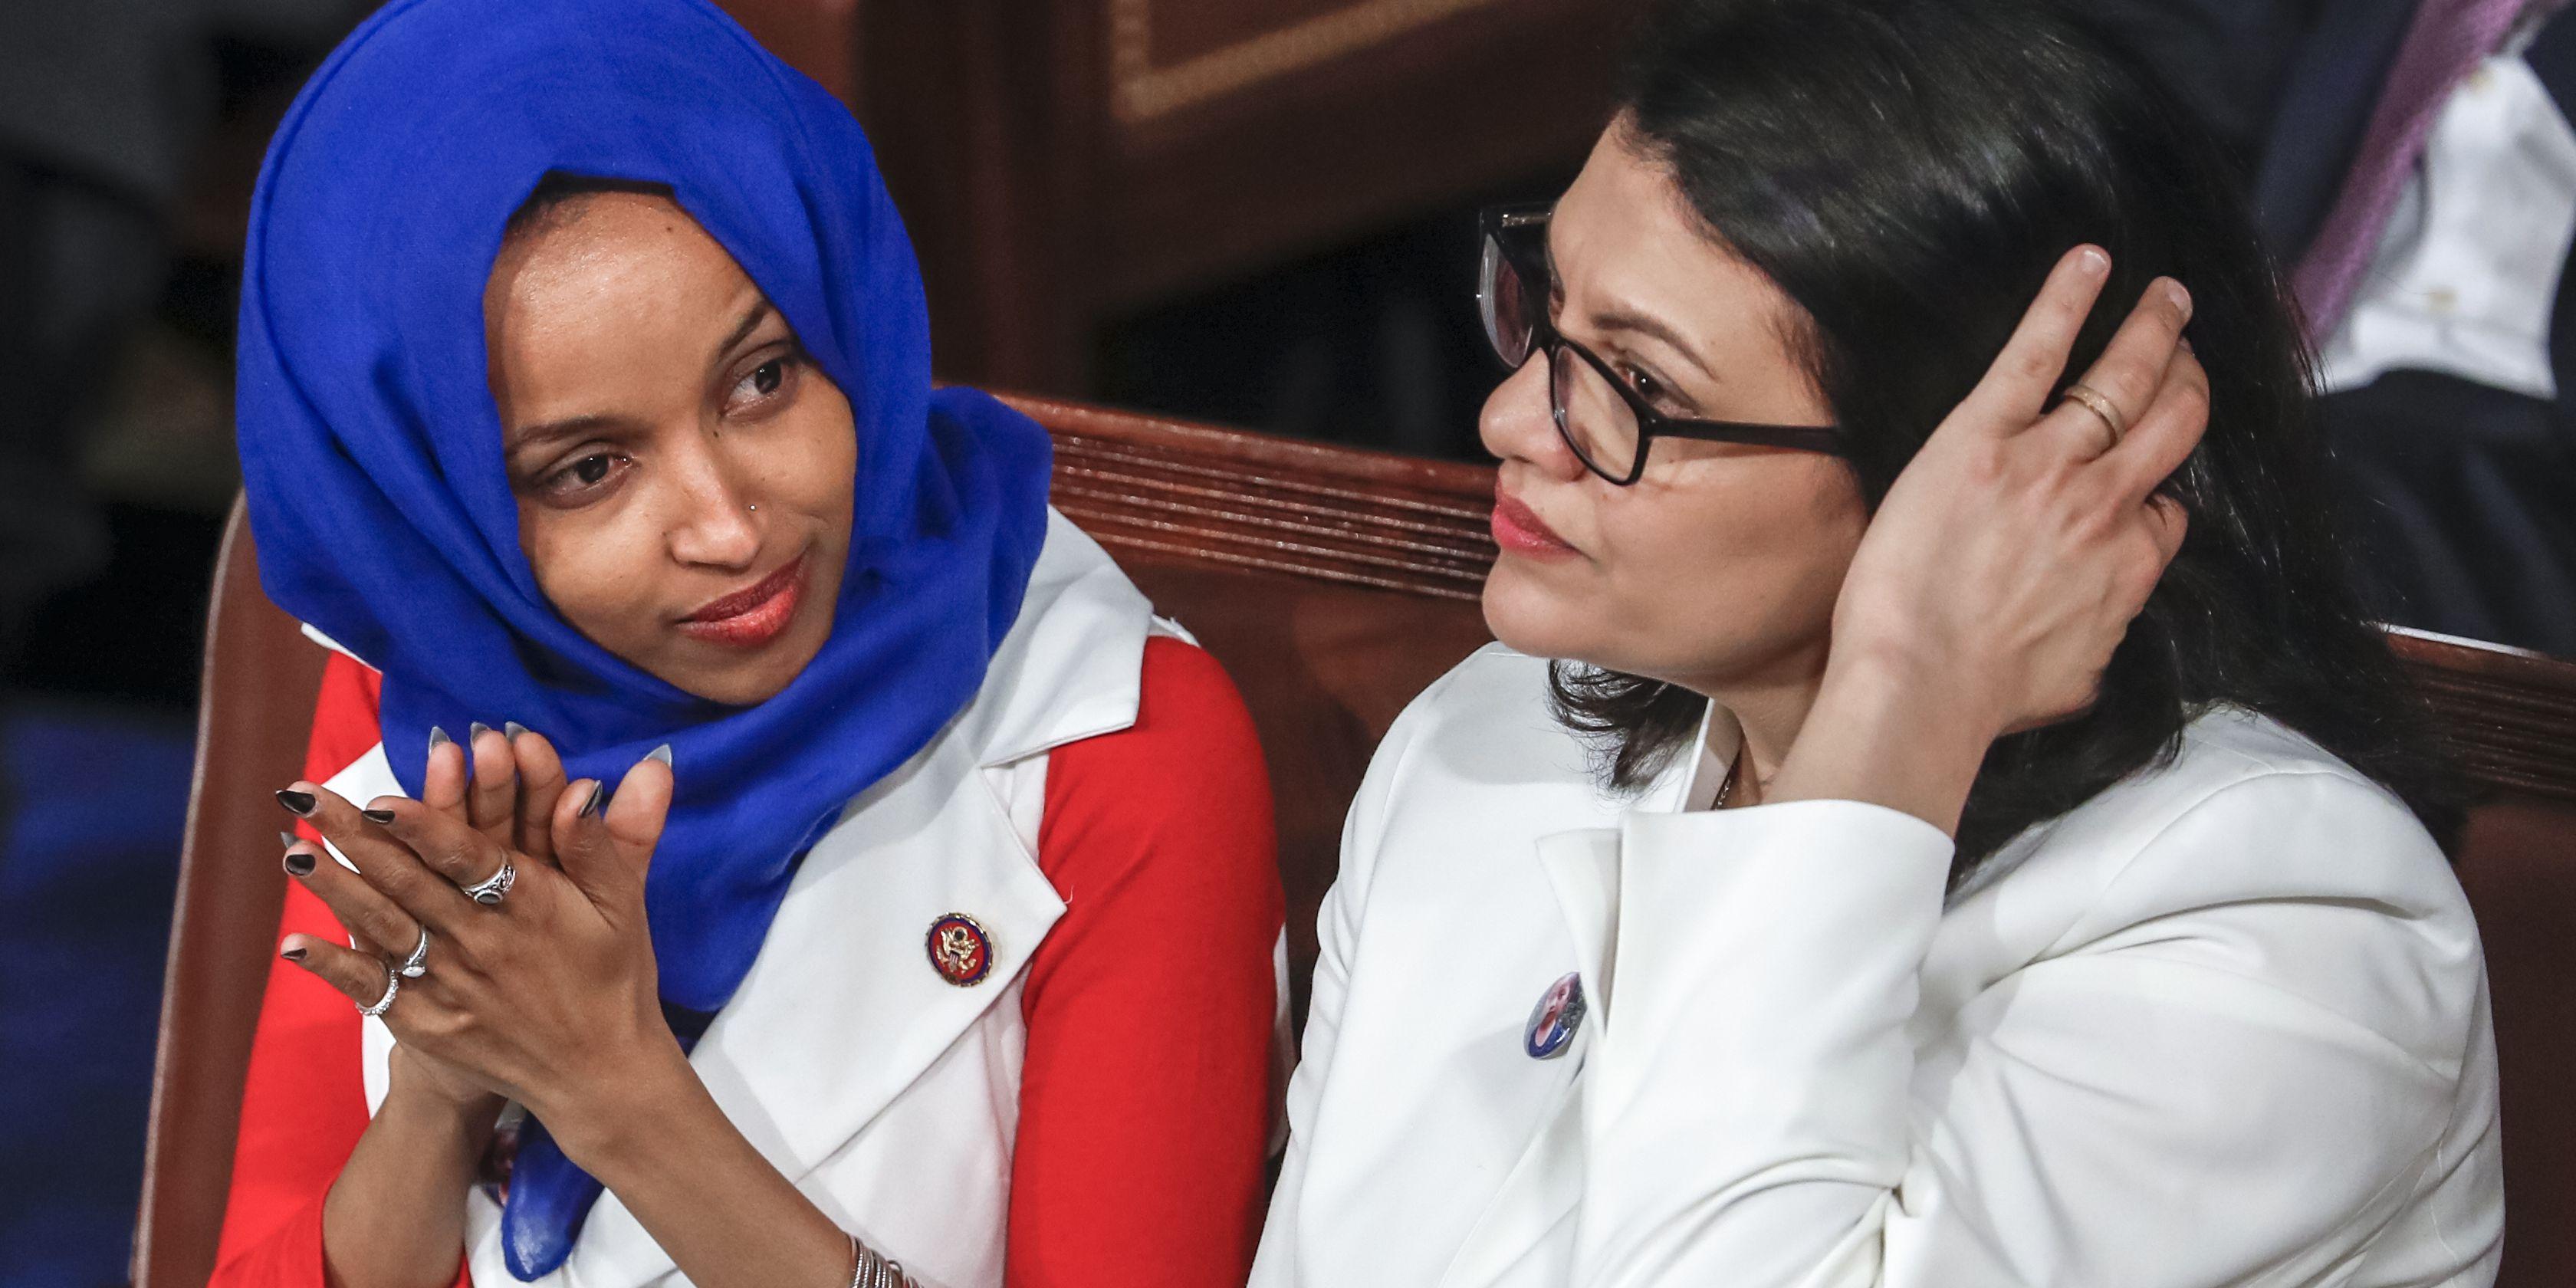 Israel bans entry to outspoken US congresswomen